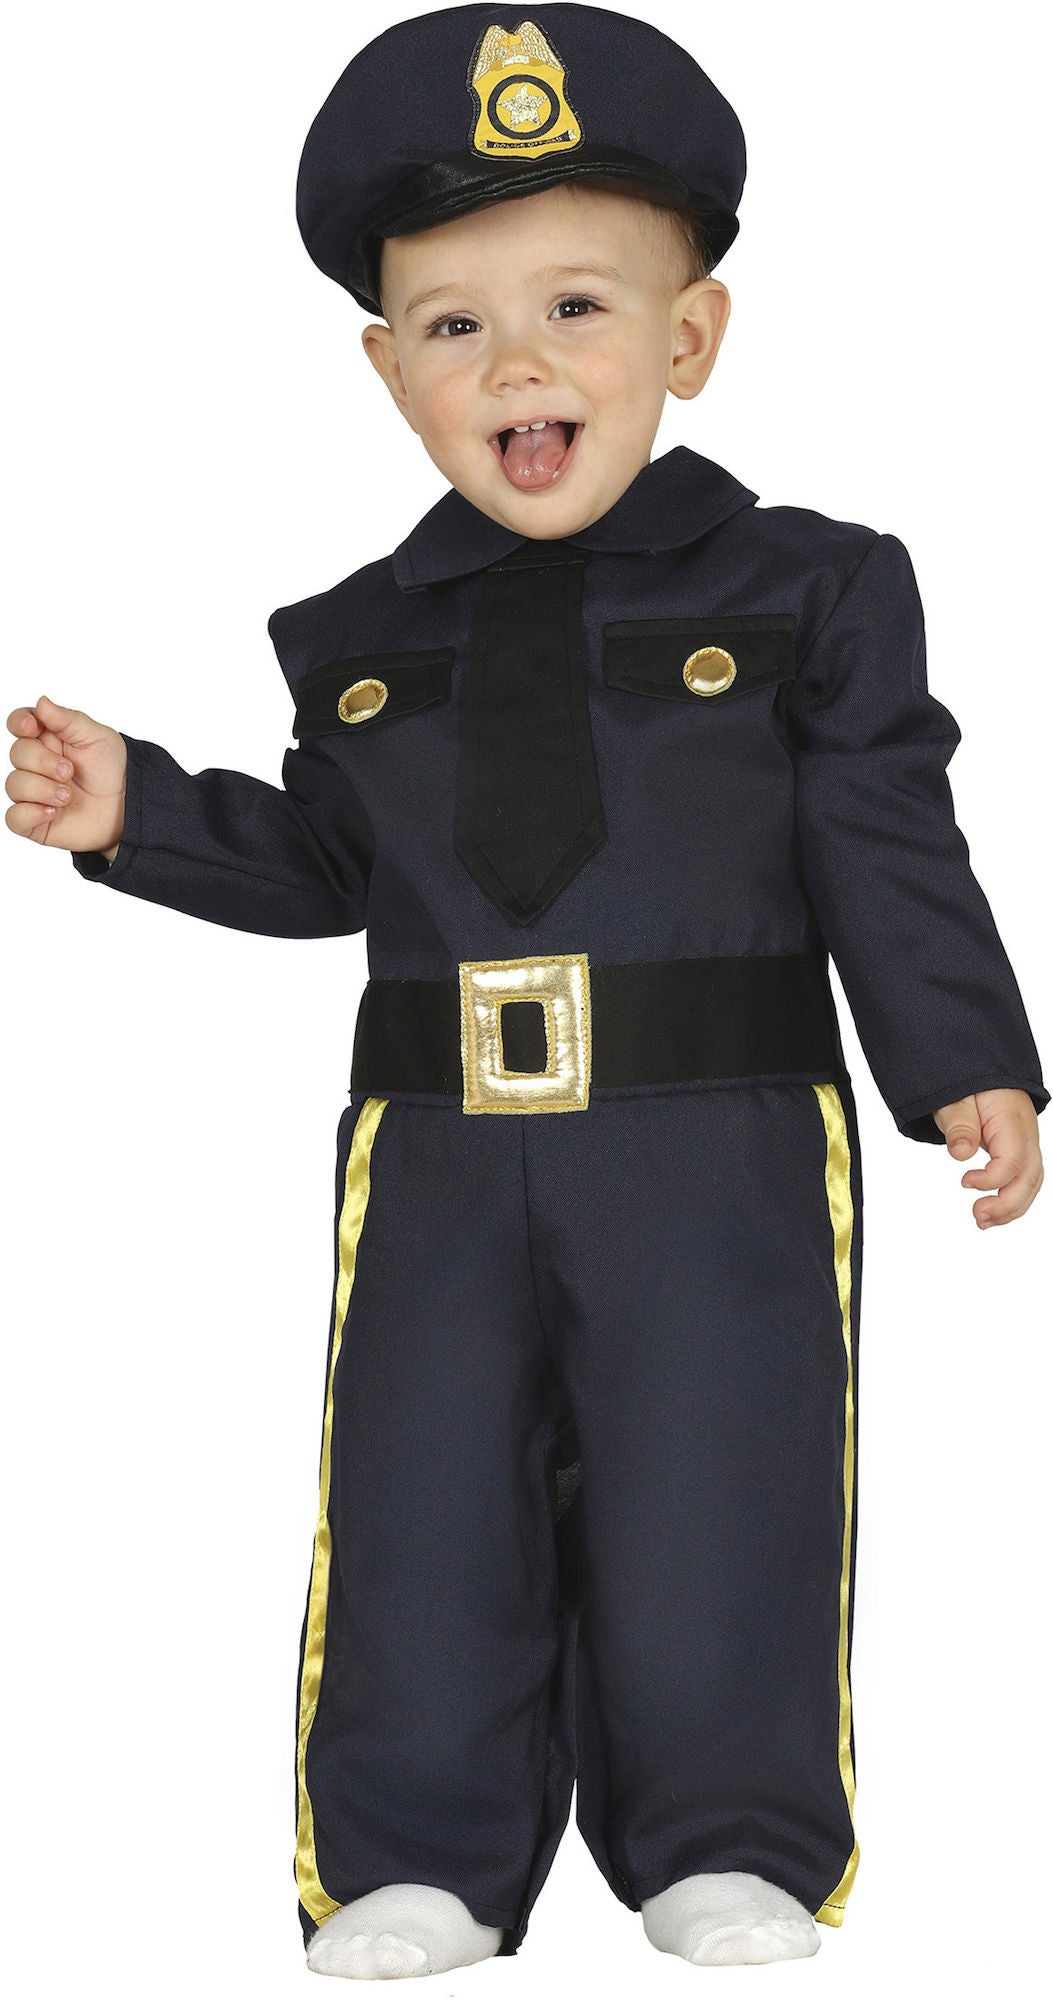 Köp Fiestas Guirca Kostym Polis  5d0a25c7328c0